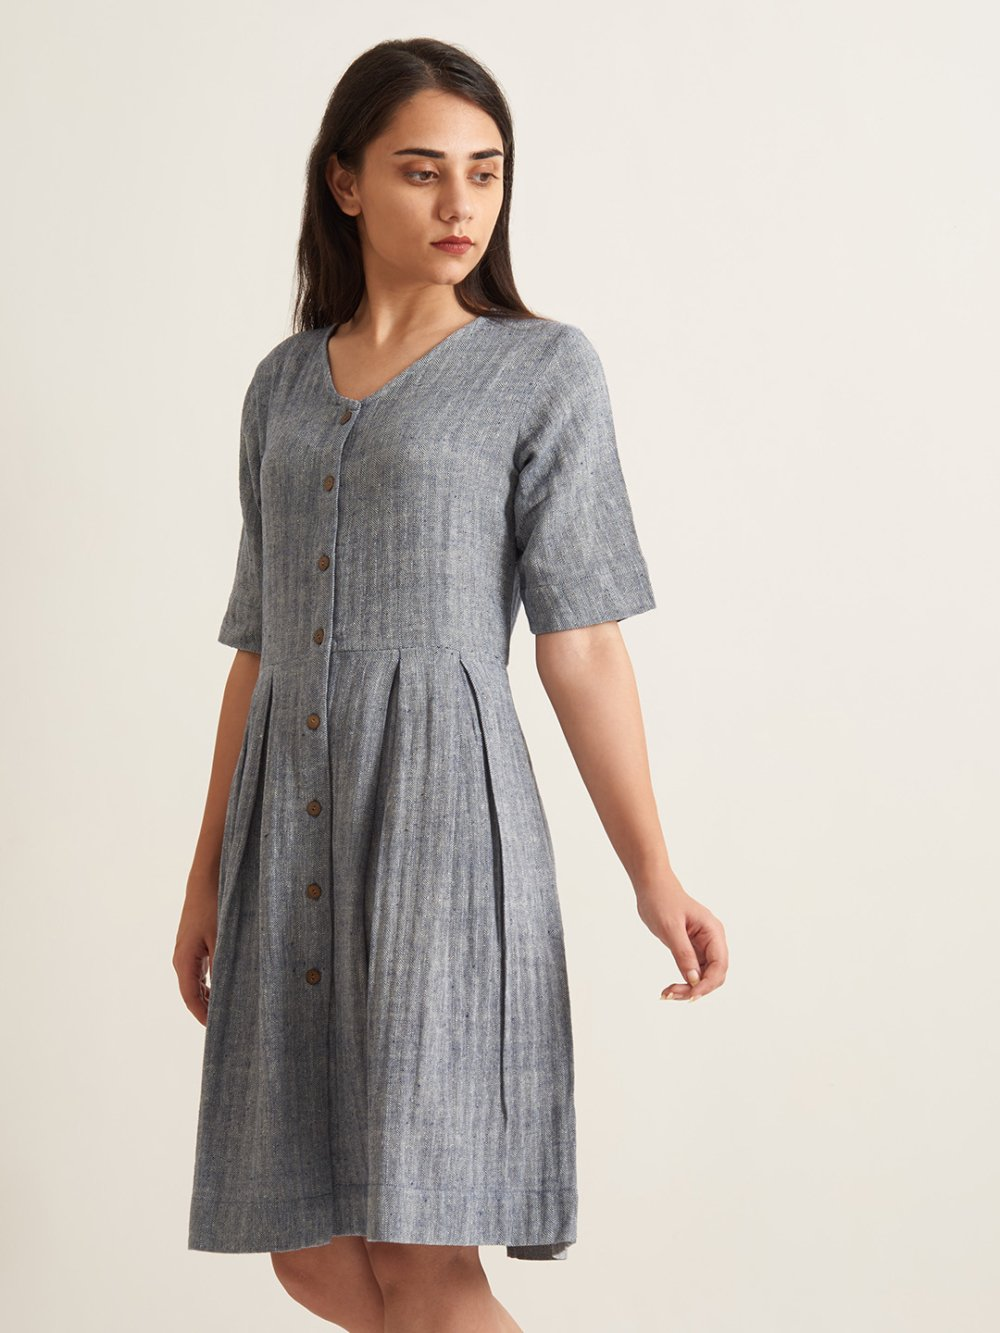 patrah.com Organic Cloth